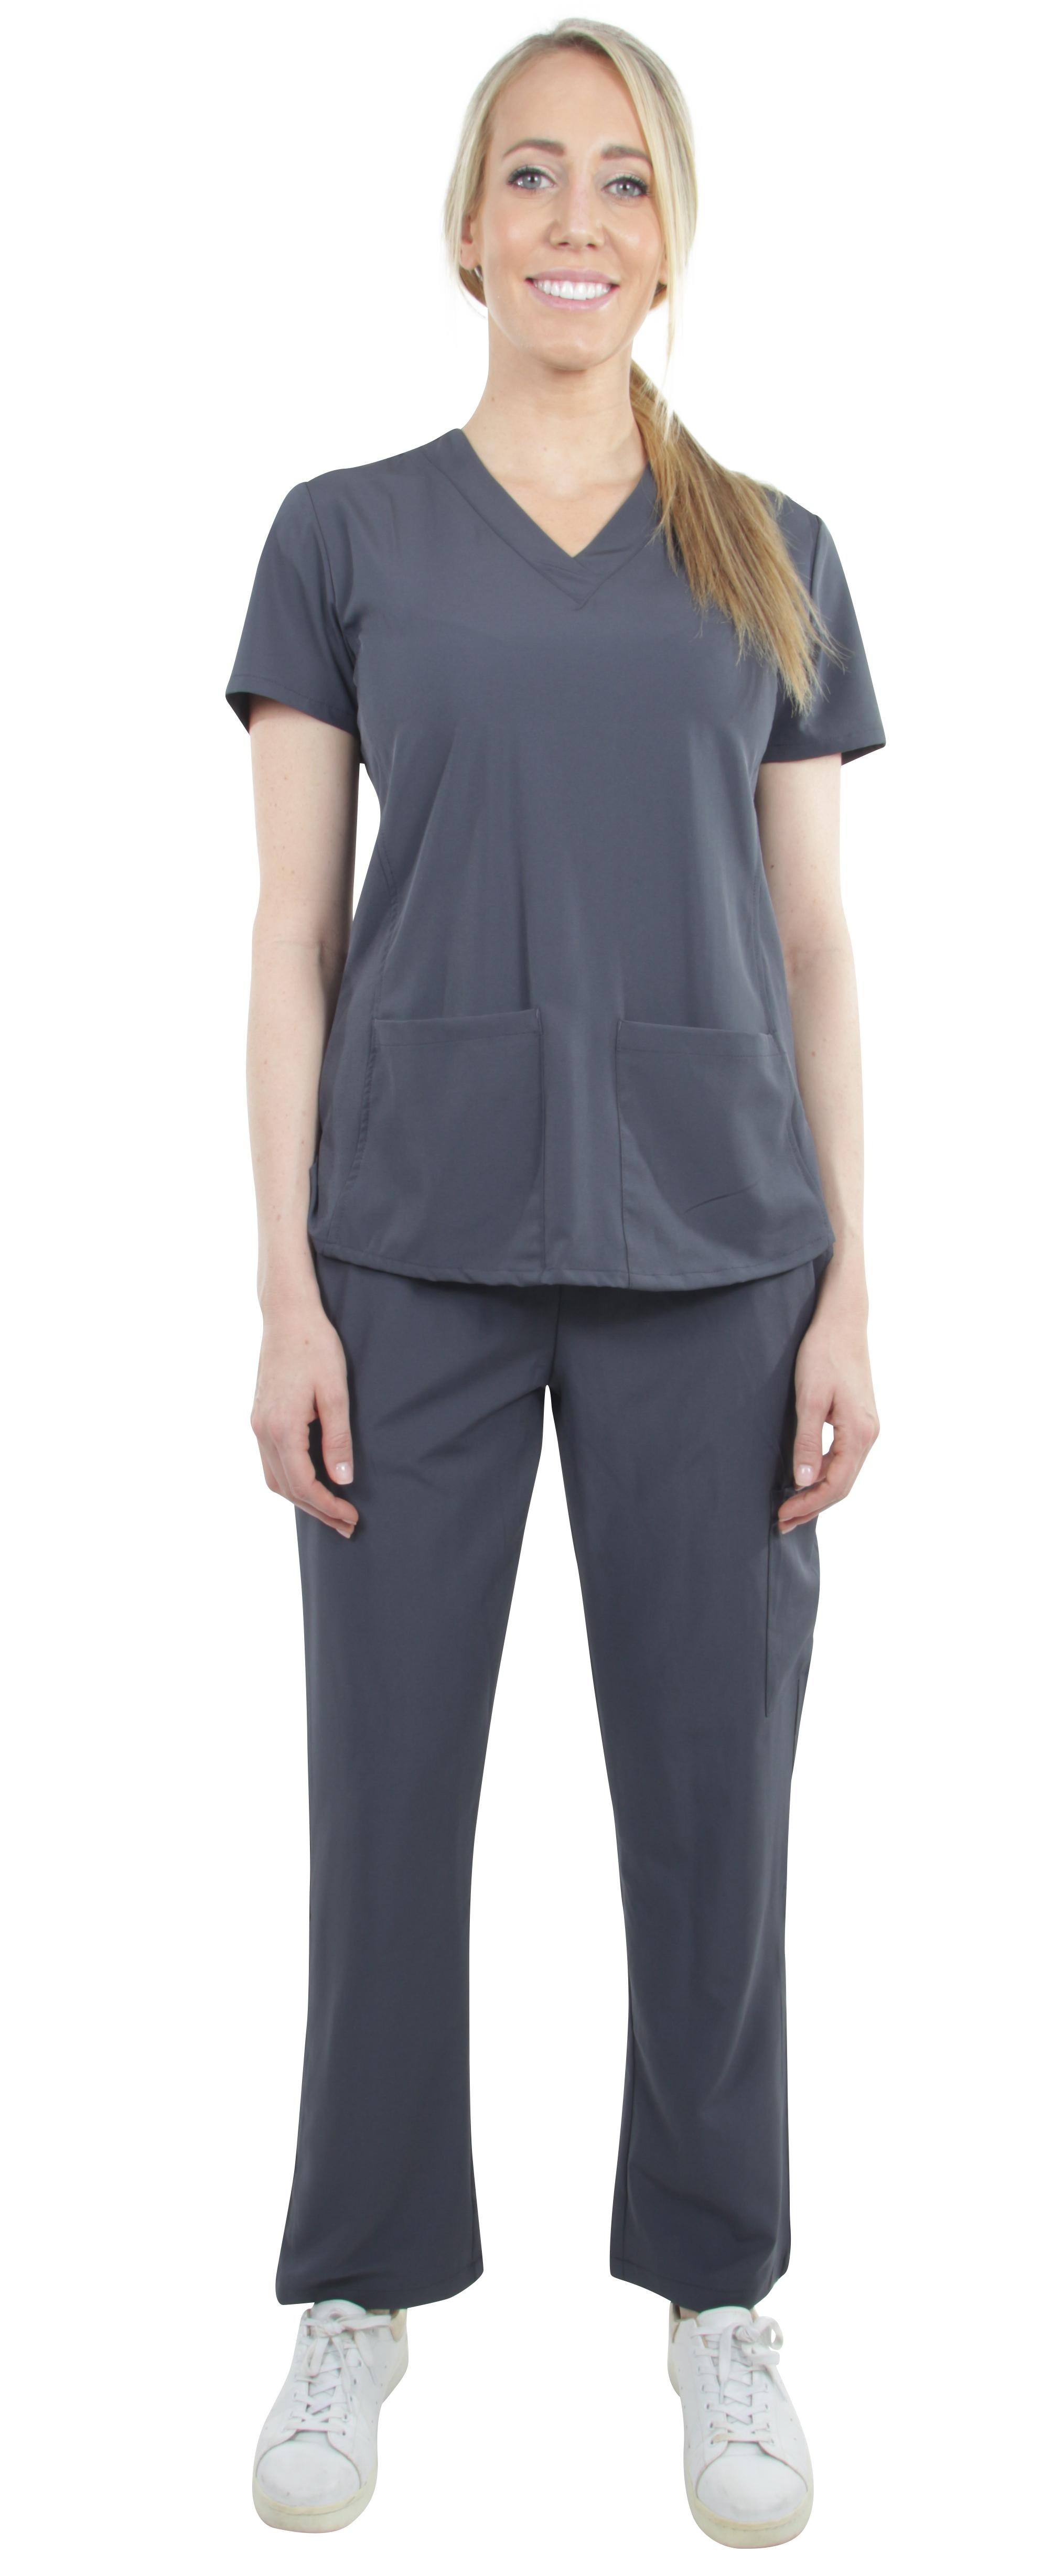 Unisex-Stretch-Medical-Uniform-Five-Pockets-V-Neck-Scrubs-Sets-with-Side-Panels thumbnail 44